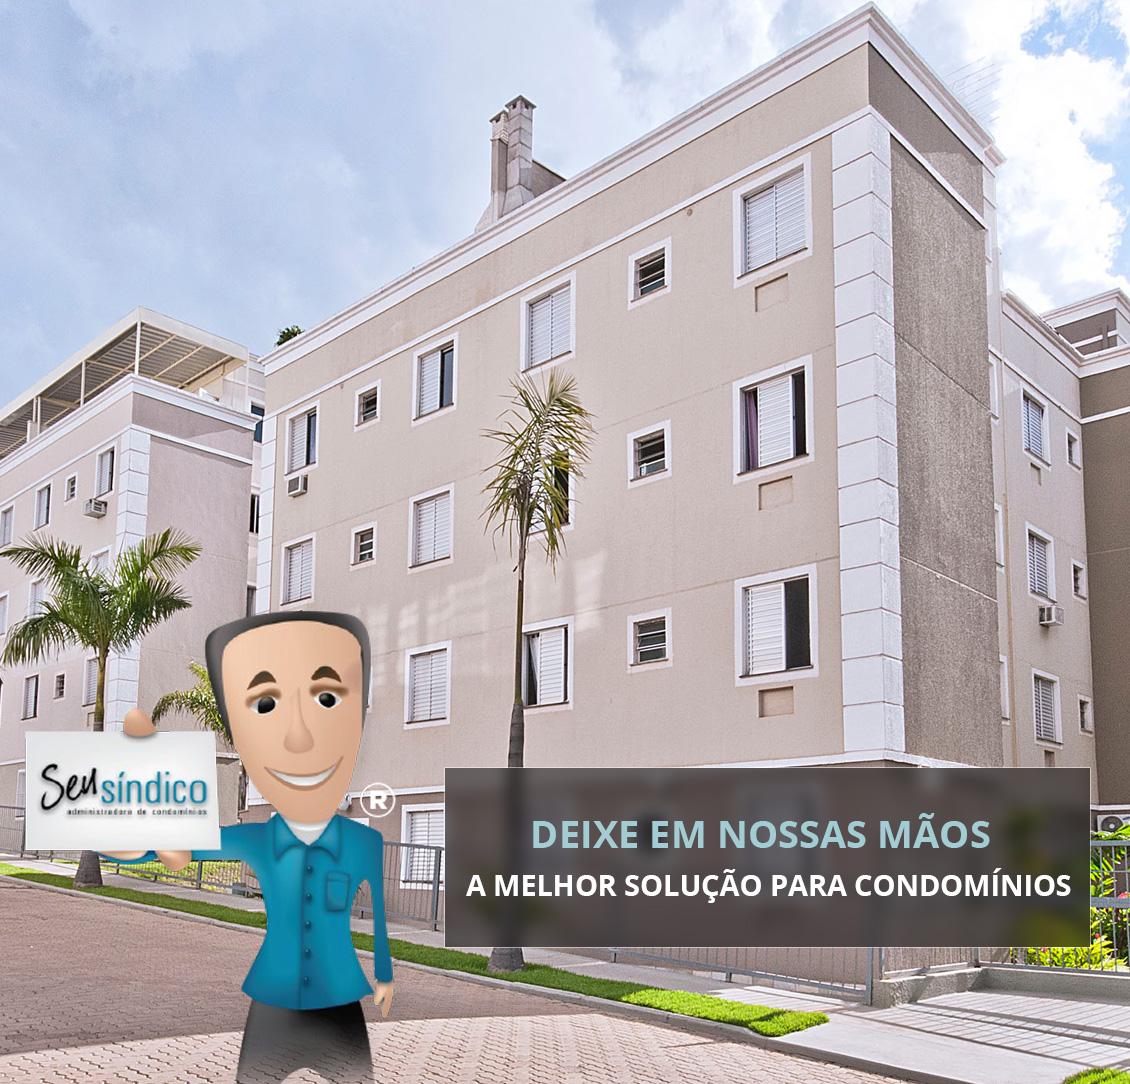 Contabilidade para condomínios em bh esclarece sobre as Diaristas